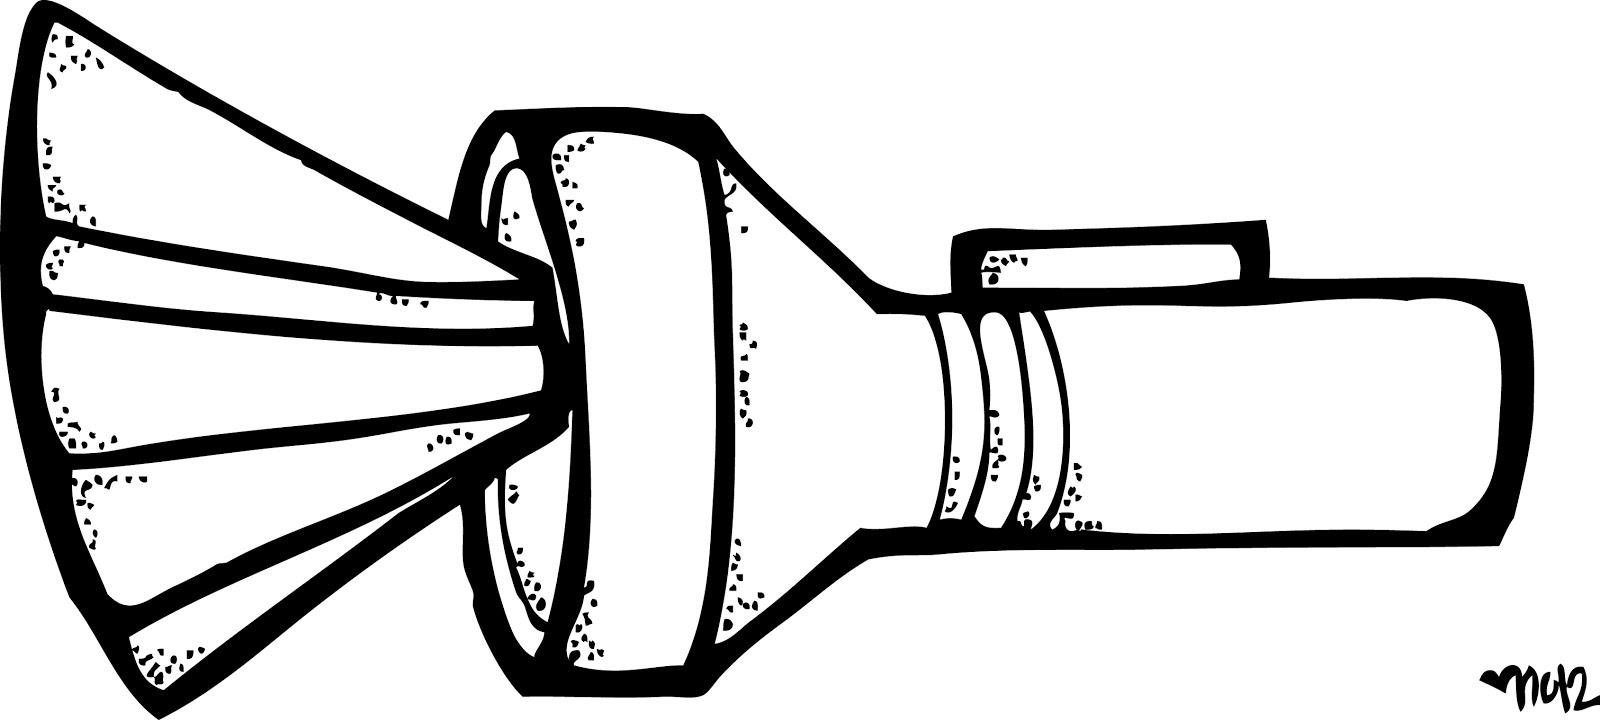 1600x720 Melonheadz Lds Illustrating Girls Camp Illustrations